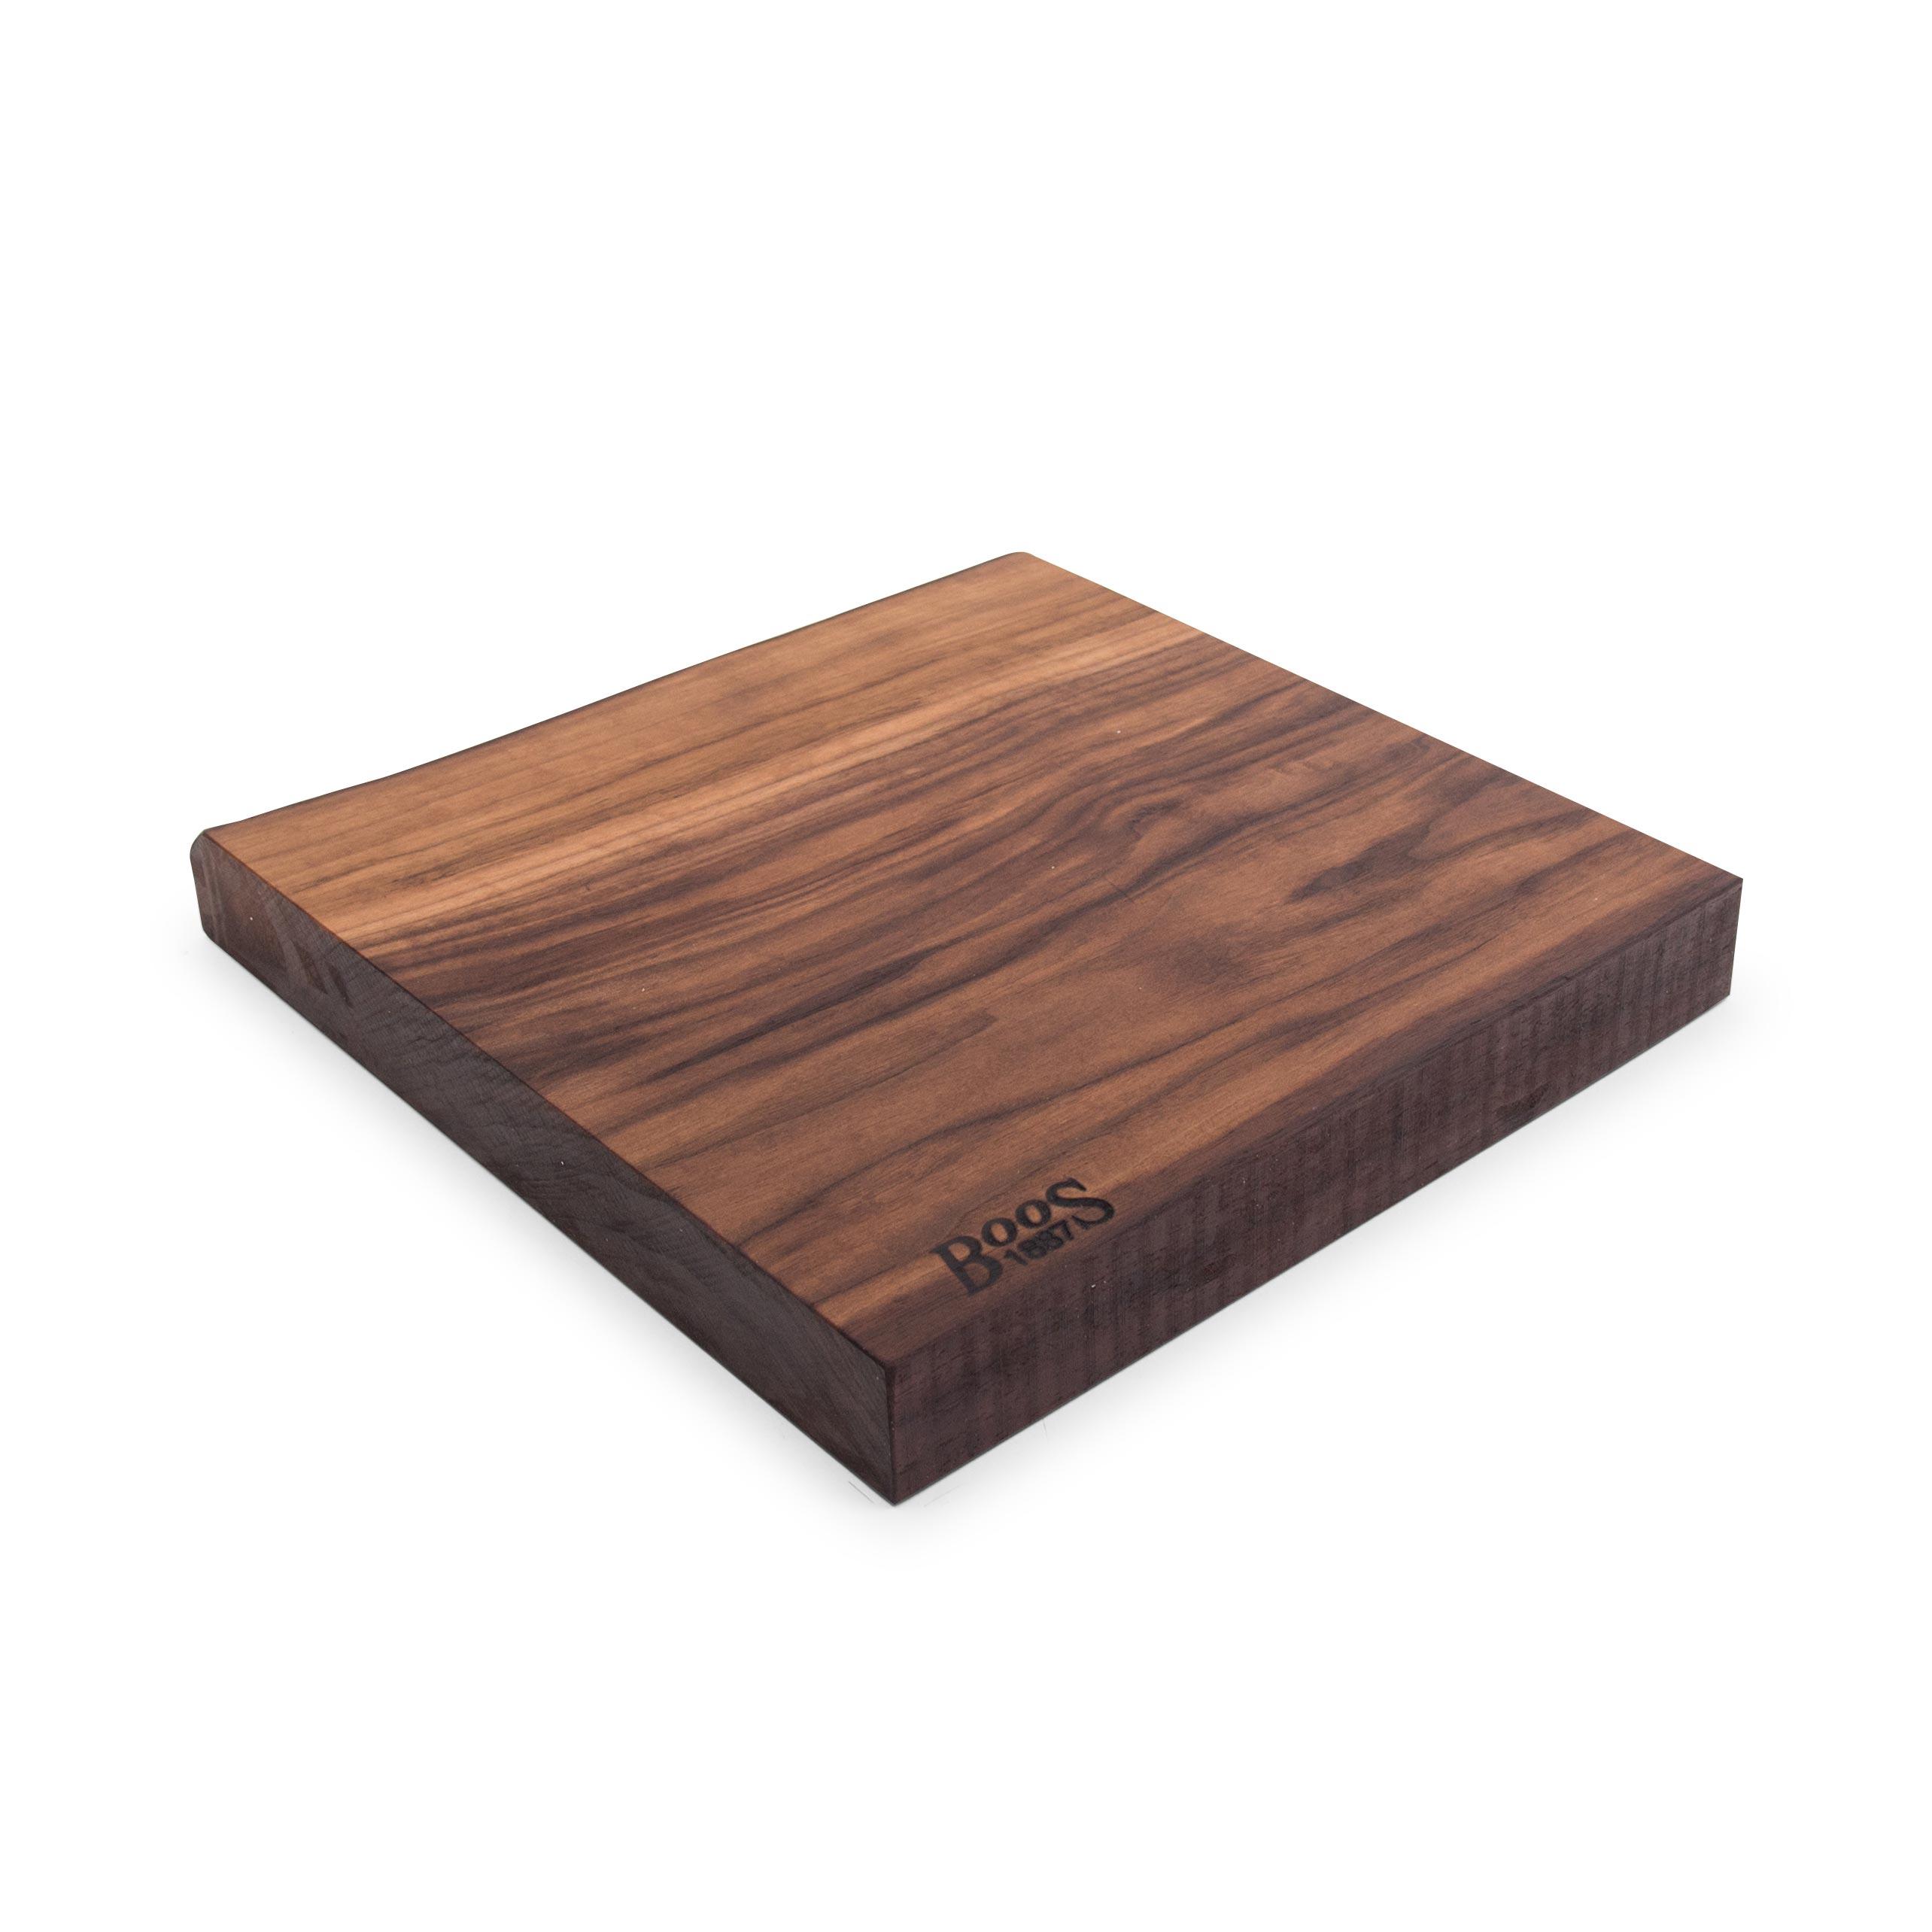 John Boos WAL-RST1312175 cutting board, wood